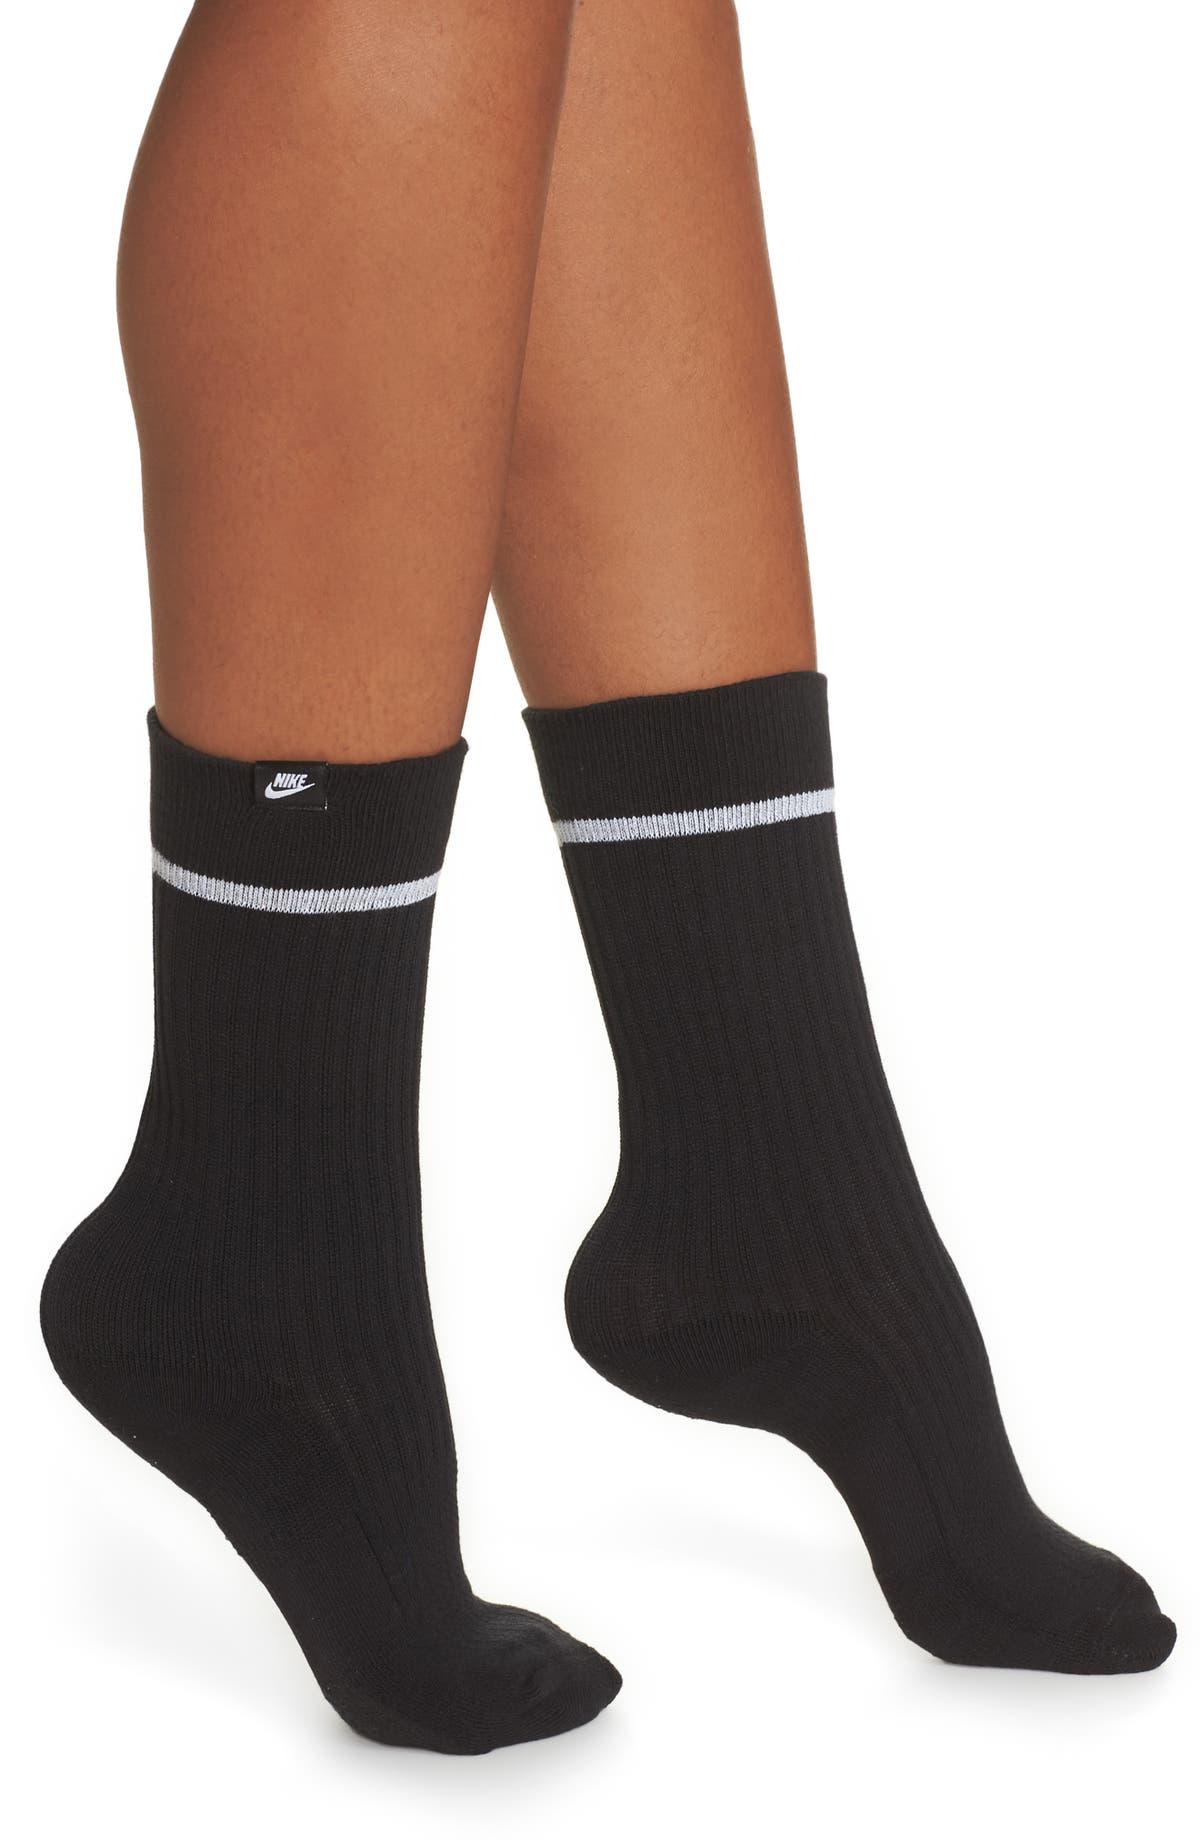 7e2511df0a Nike NikeLab 2-Pack Essential Crew Socks | Nordstrom